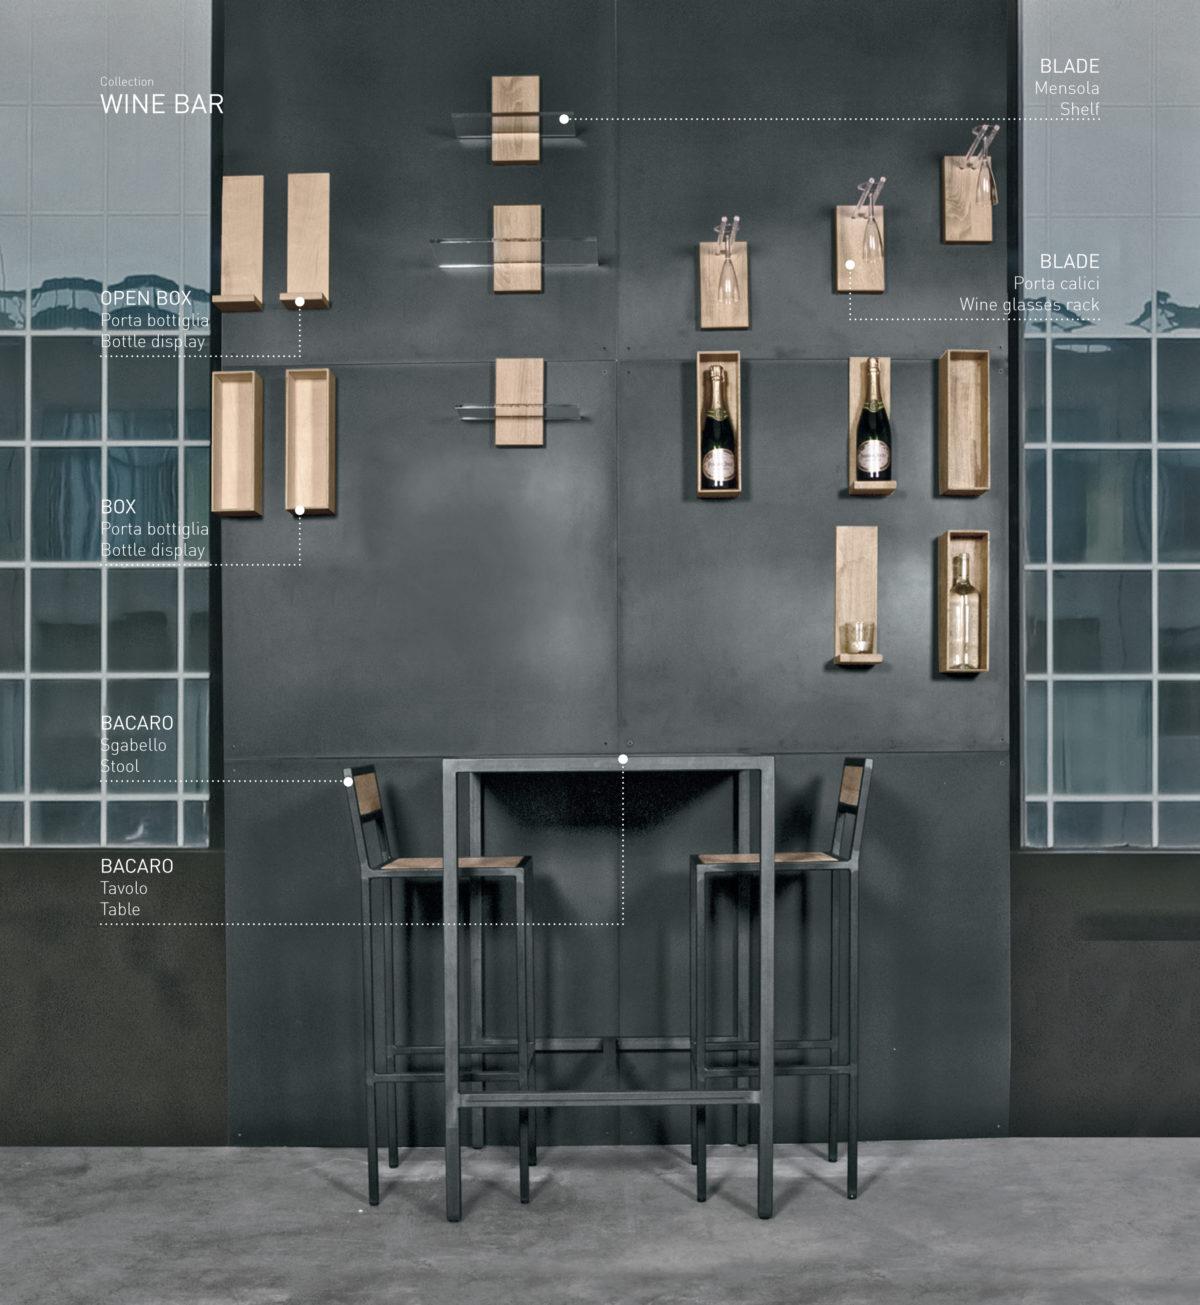 tavolino bacaro parete wine bar magnetika arredo design magnetico per bar e ristoranti magnetika - design ristoranti e bar